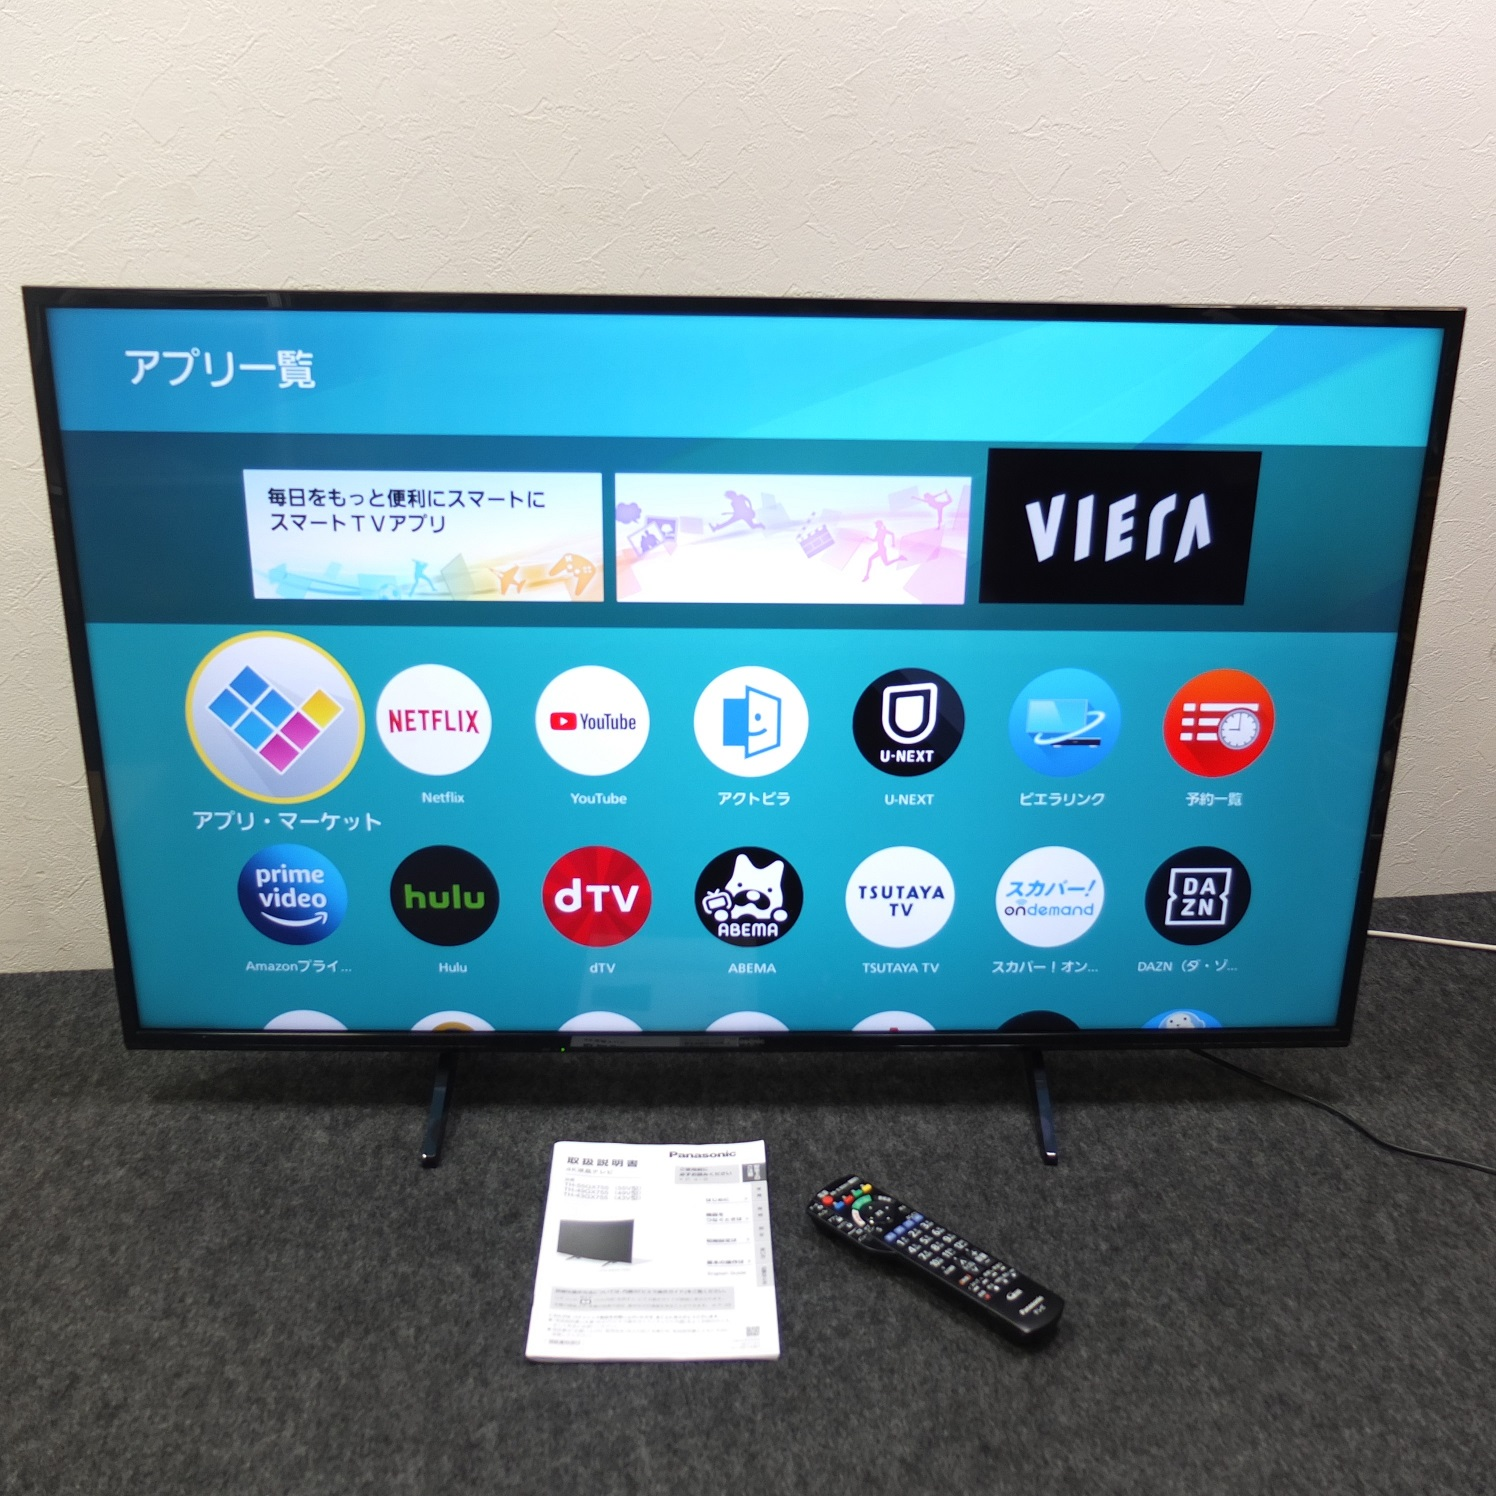 Panasonic VIERA TH-49GX755 4Kチューナー内蔵テレビ